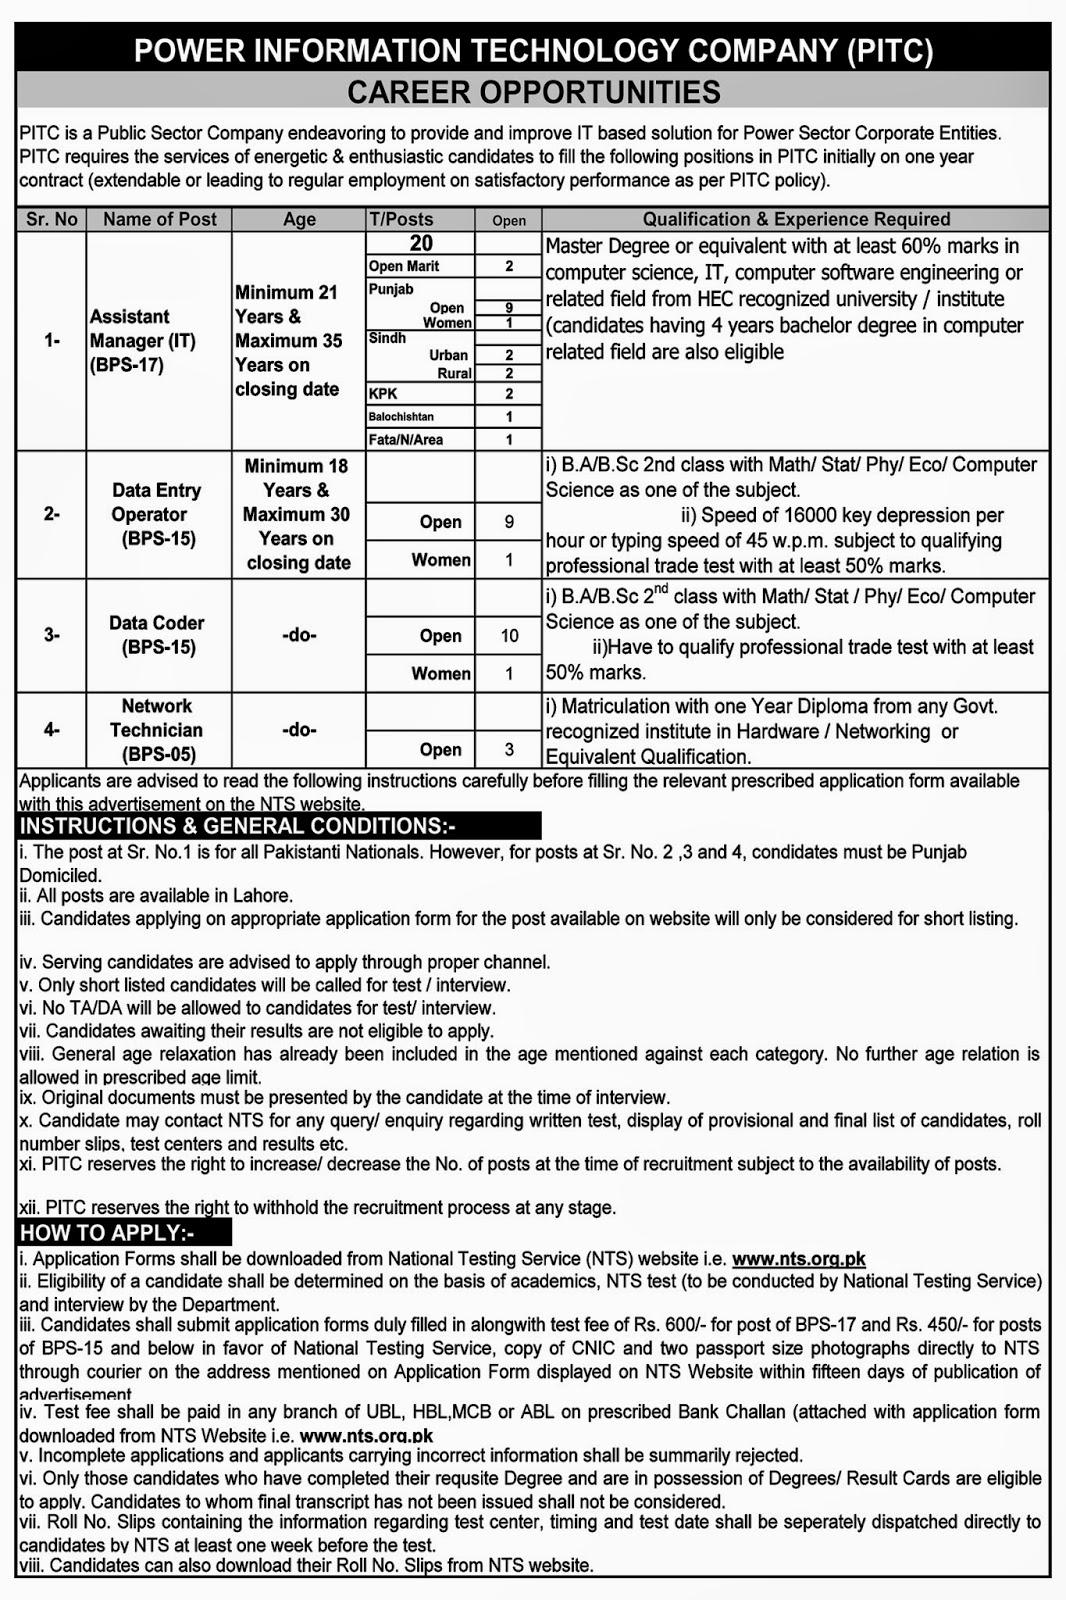 PITC Govt Jobs in Pakistan